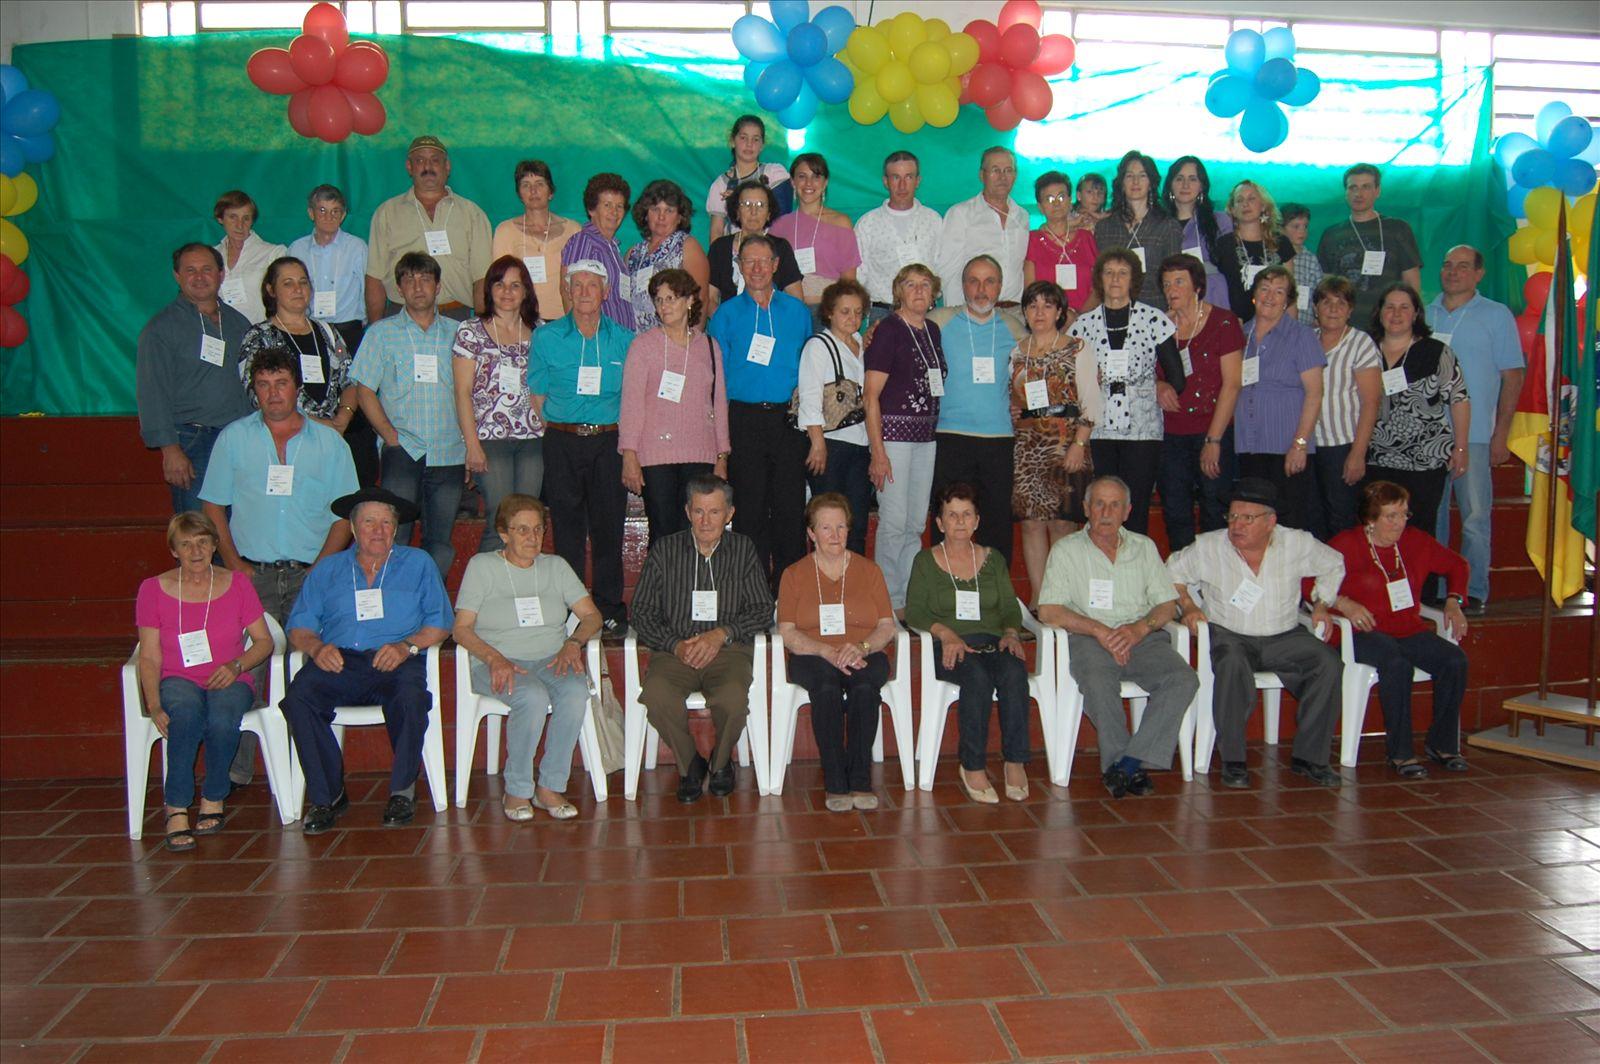 2º Encontro Família Cornelli - 11.10.2009 (185)_0